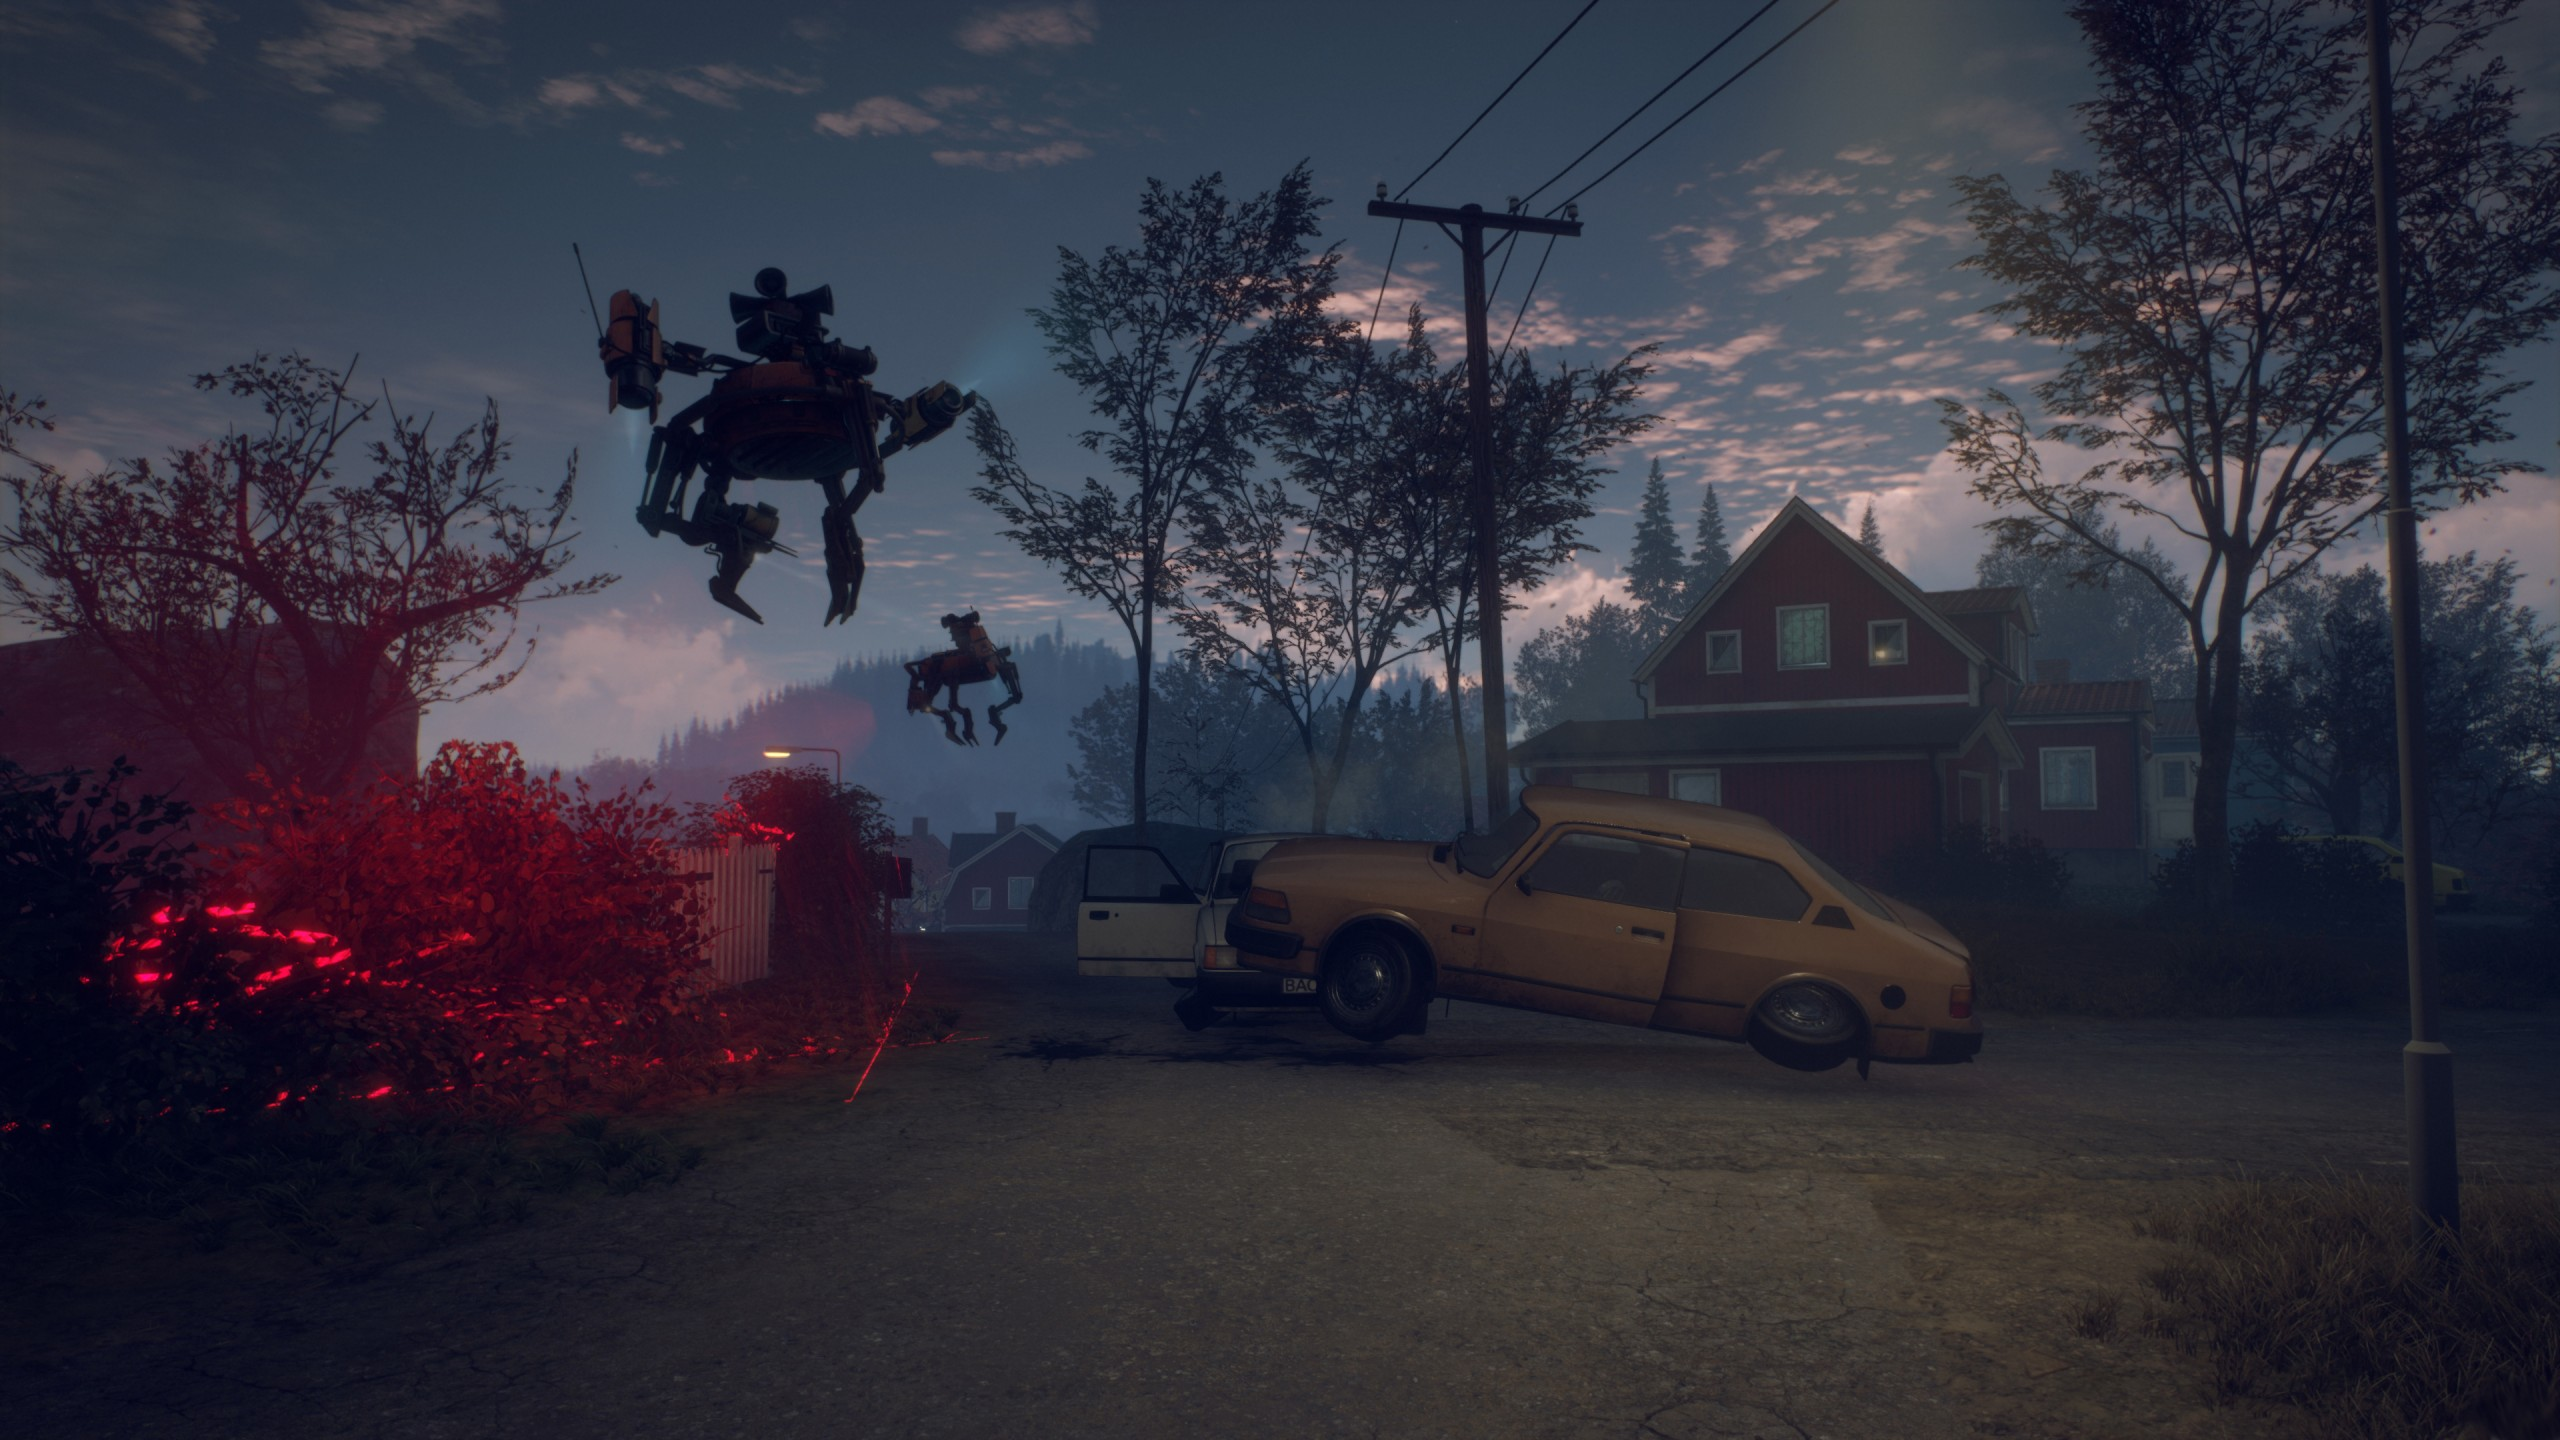 wallpaper generation zero  gamescom 2018  screenshot  4k